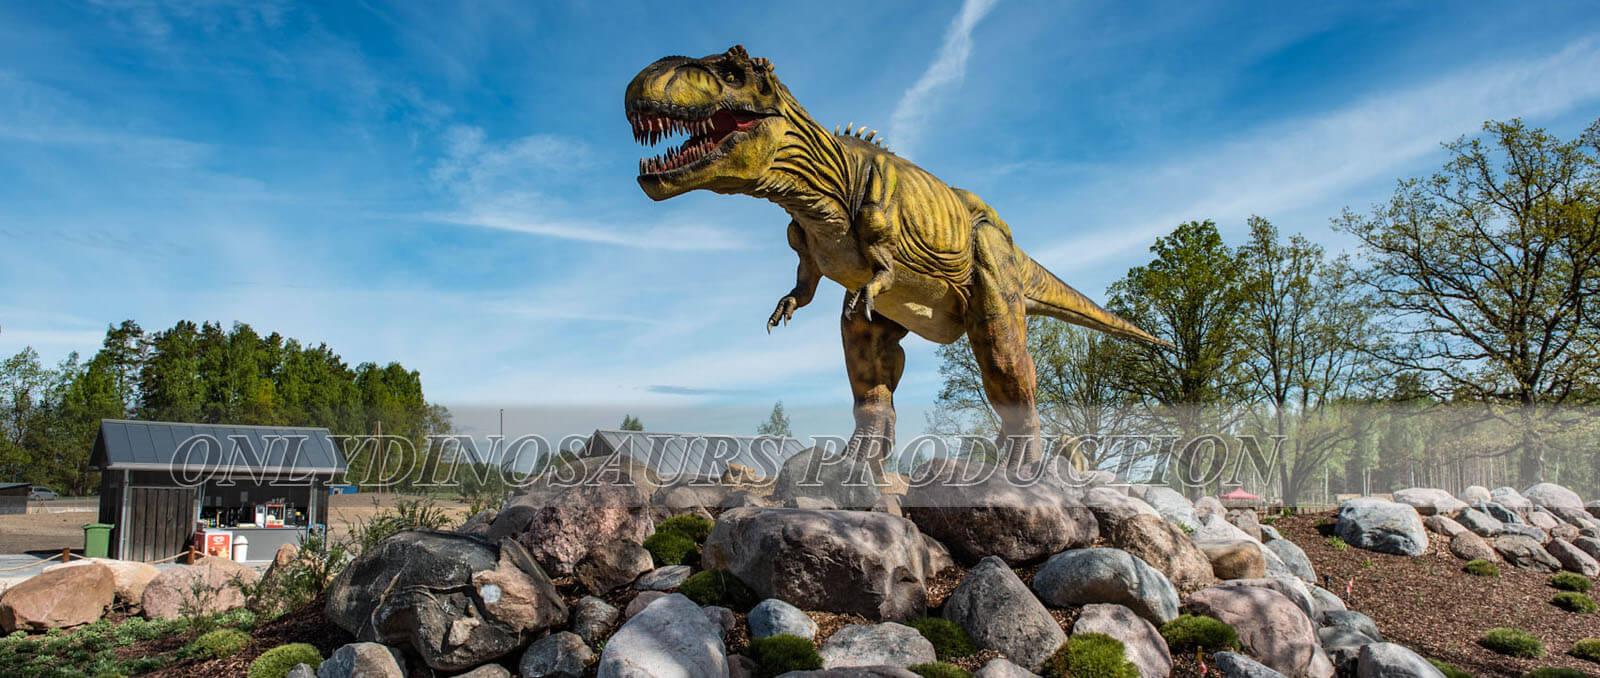 Animatronic T-Rex in Dinosaur Theme Park